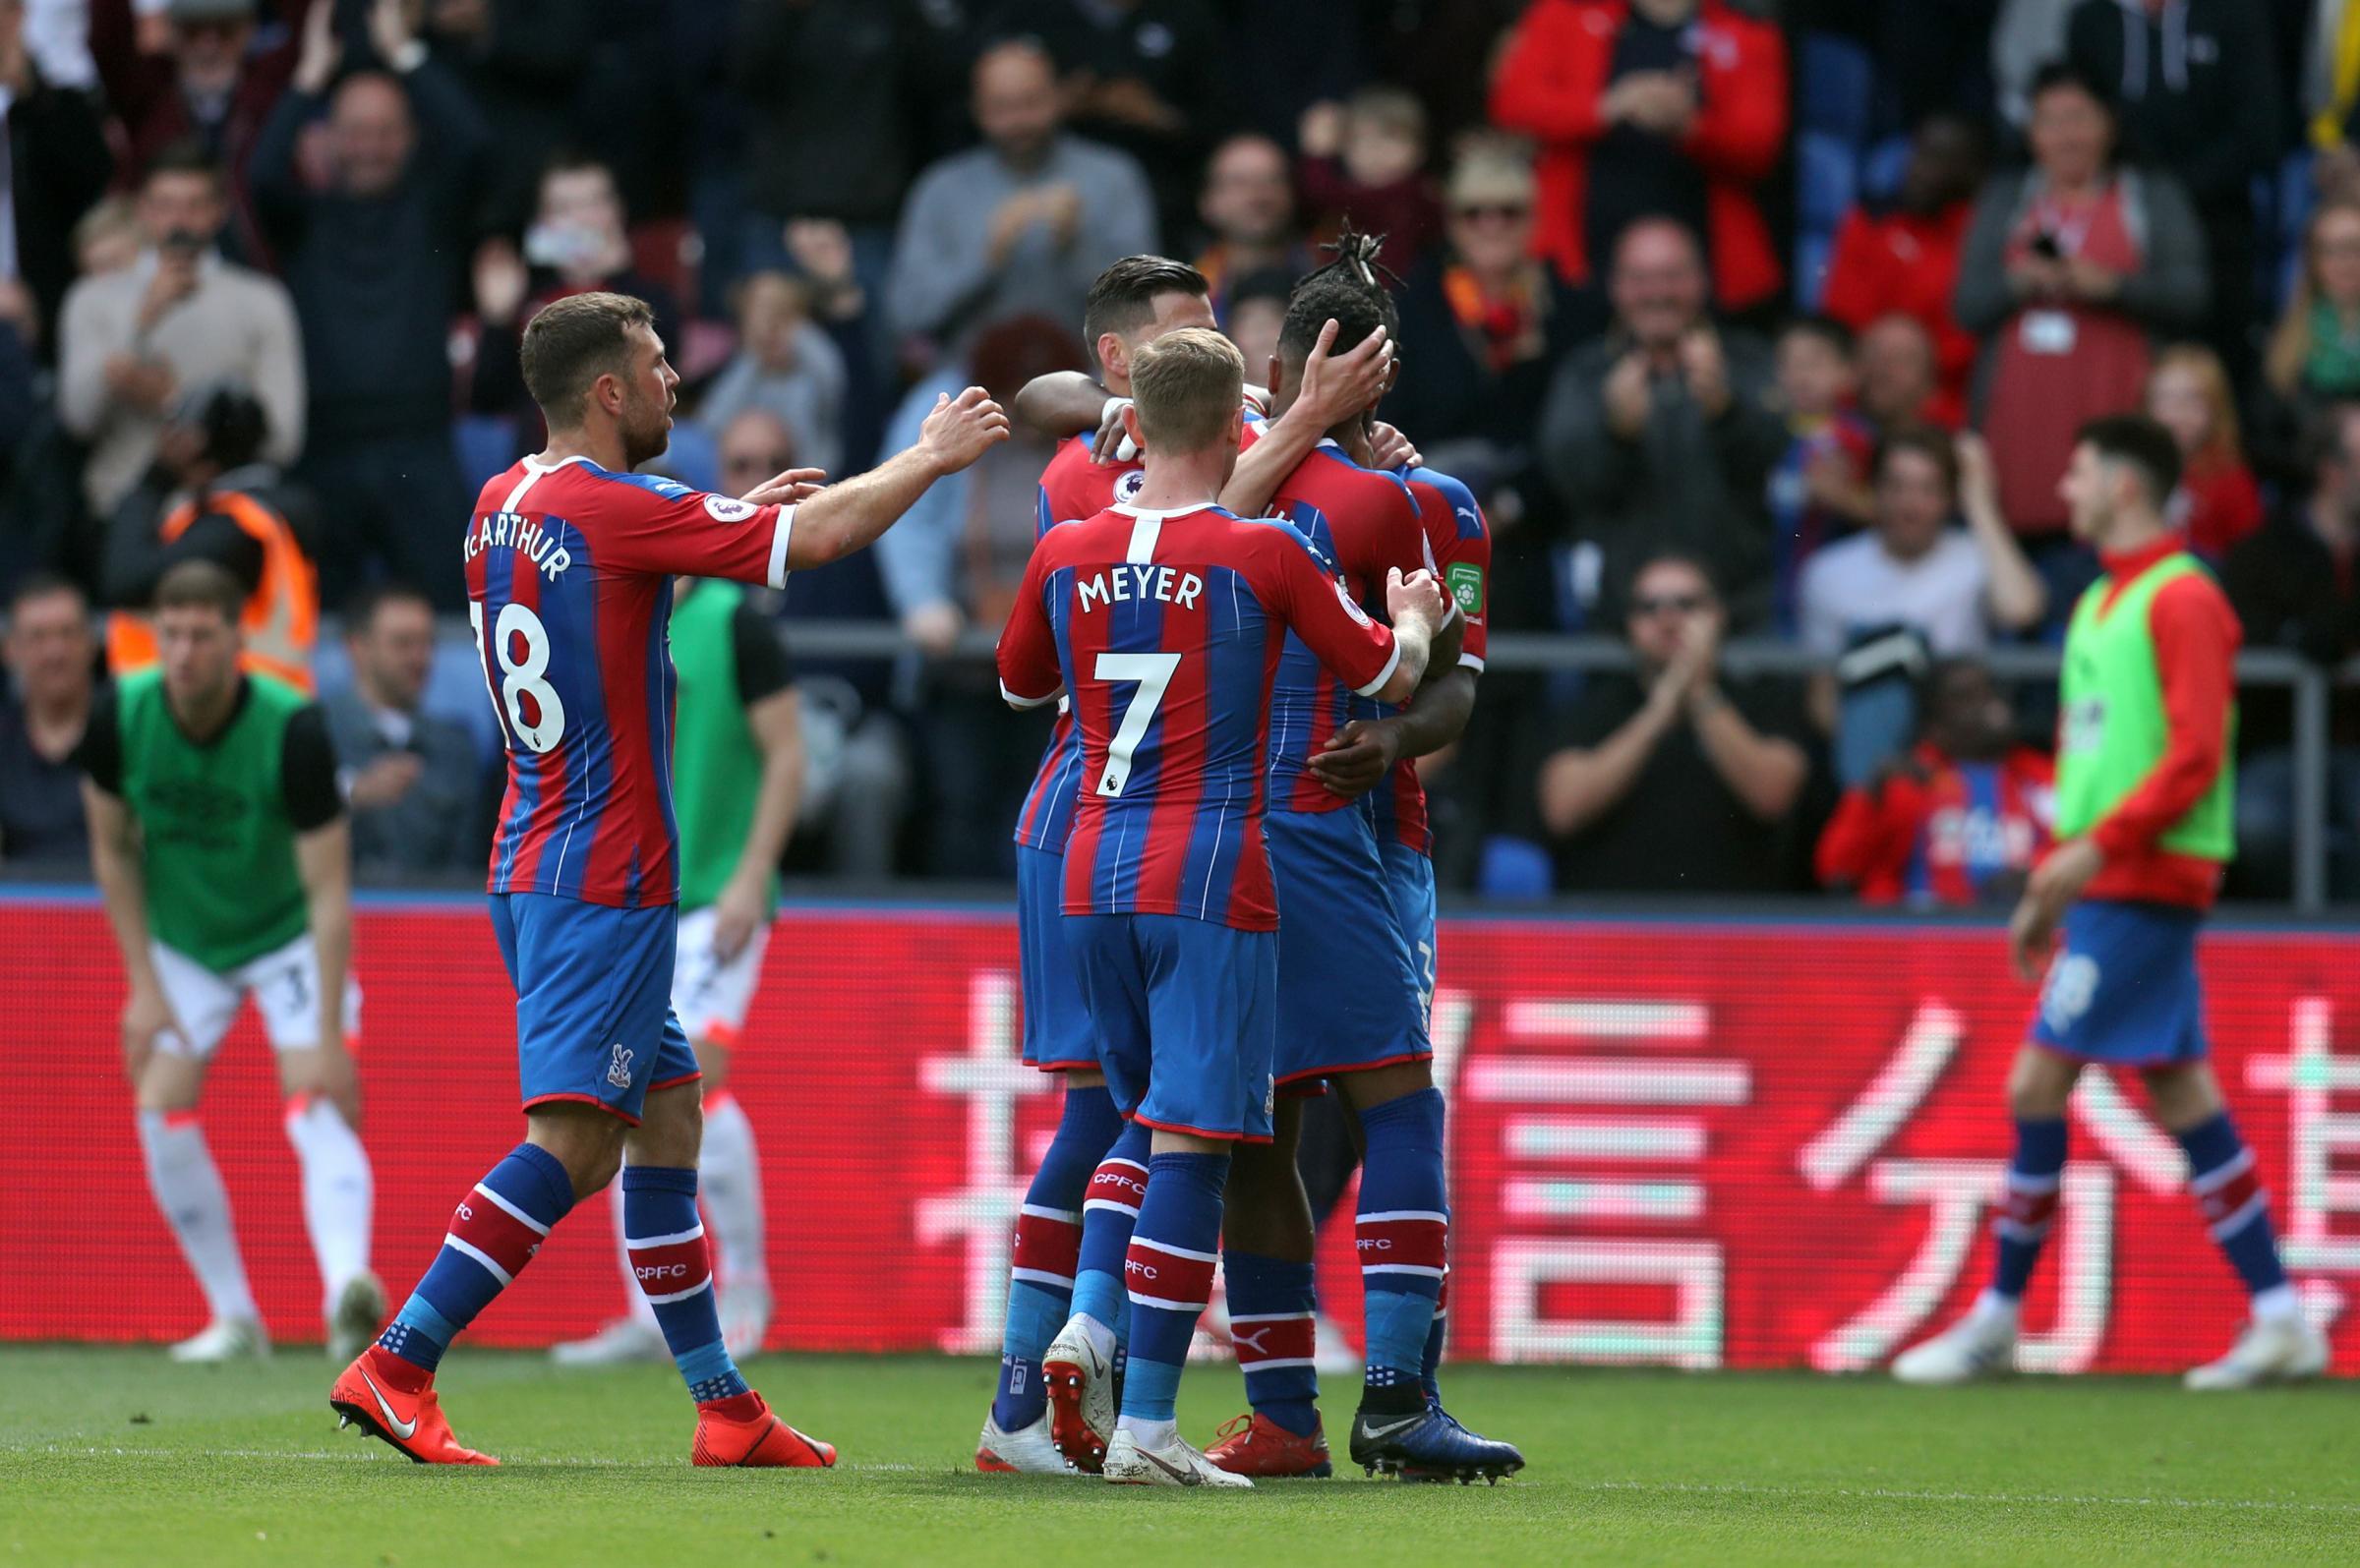 Palace fans echo Hodgson's feelings as scoring ace set to leave